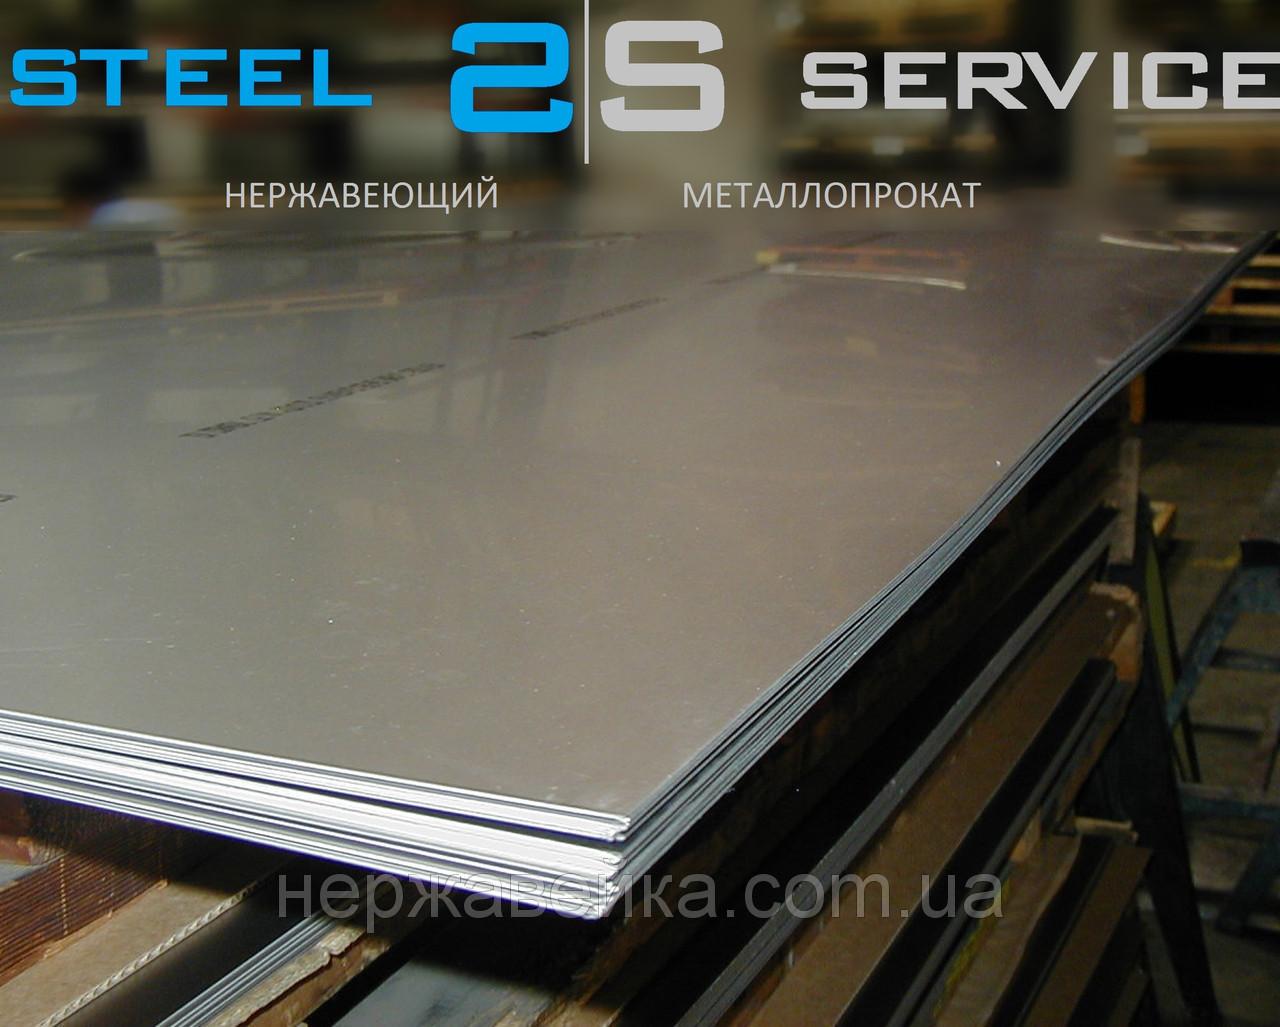 Нержавейка лист 2х1000х2000мм  AISI 316Ti(10Х17Н13М2Т) 2B - матовый,  кислотостойкий